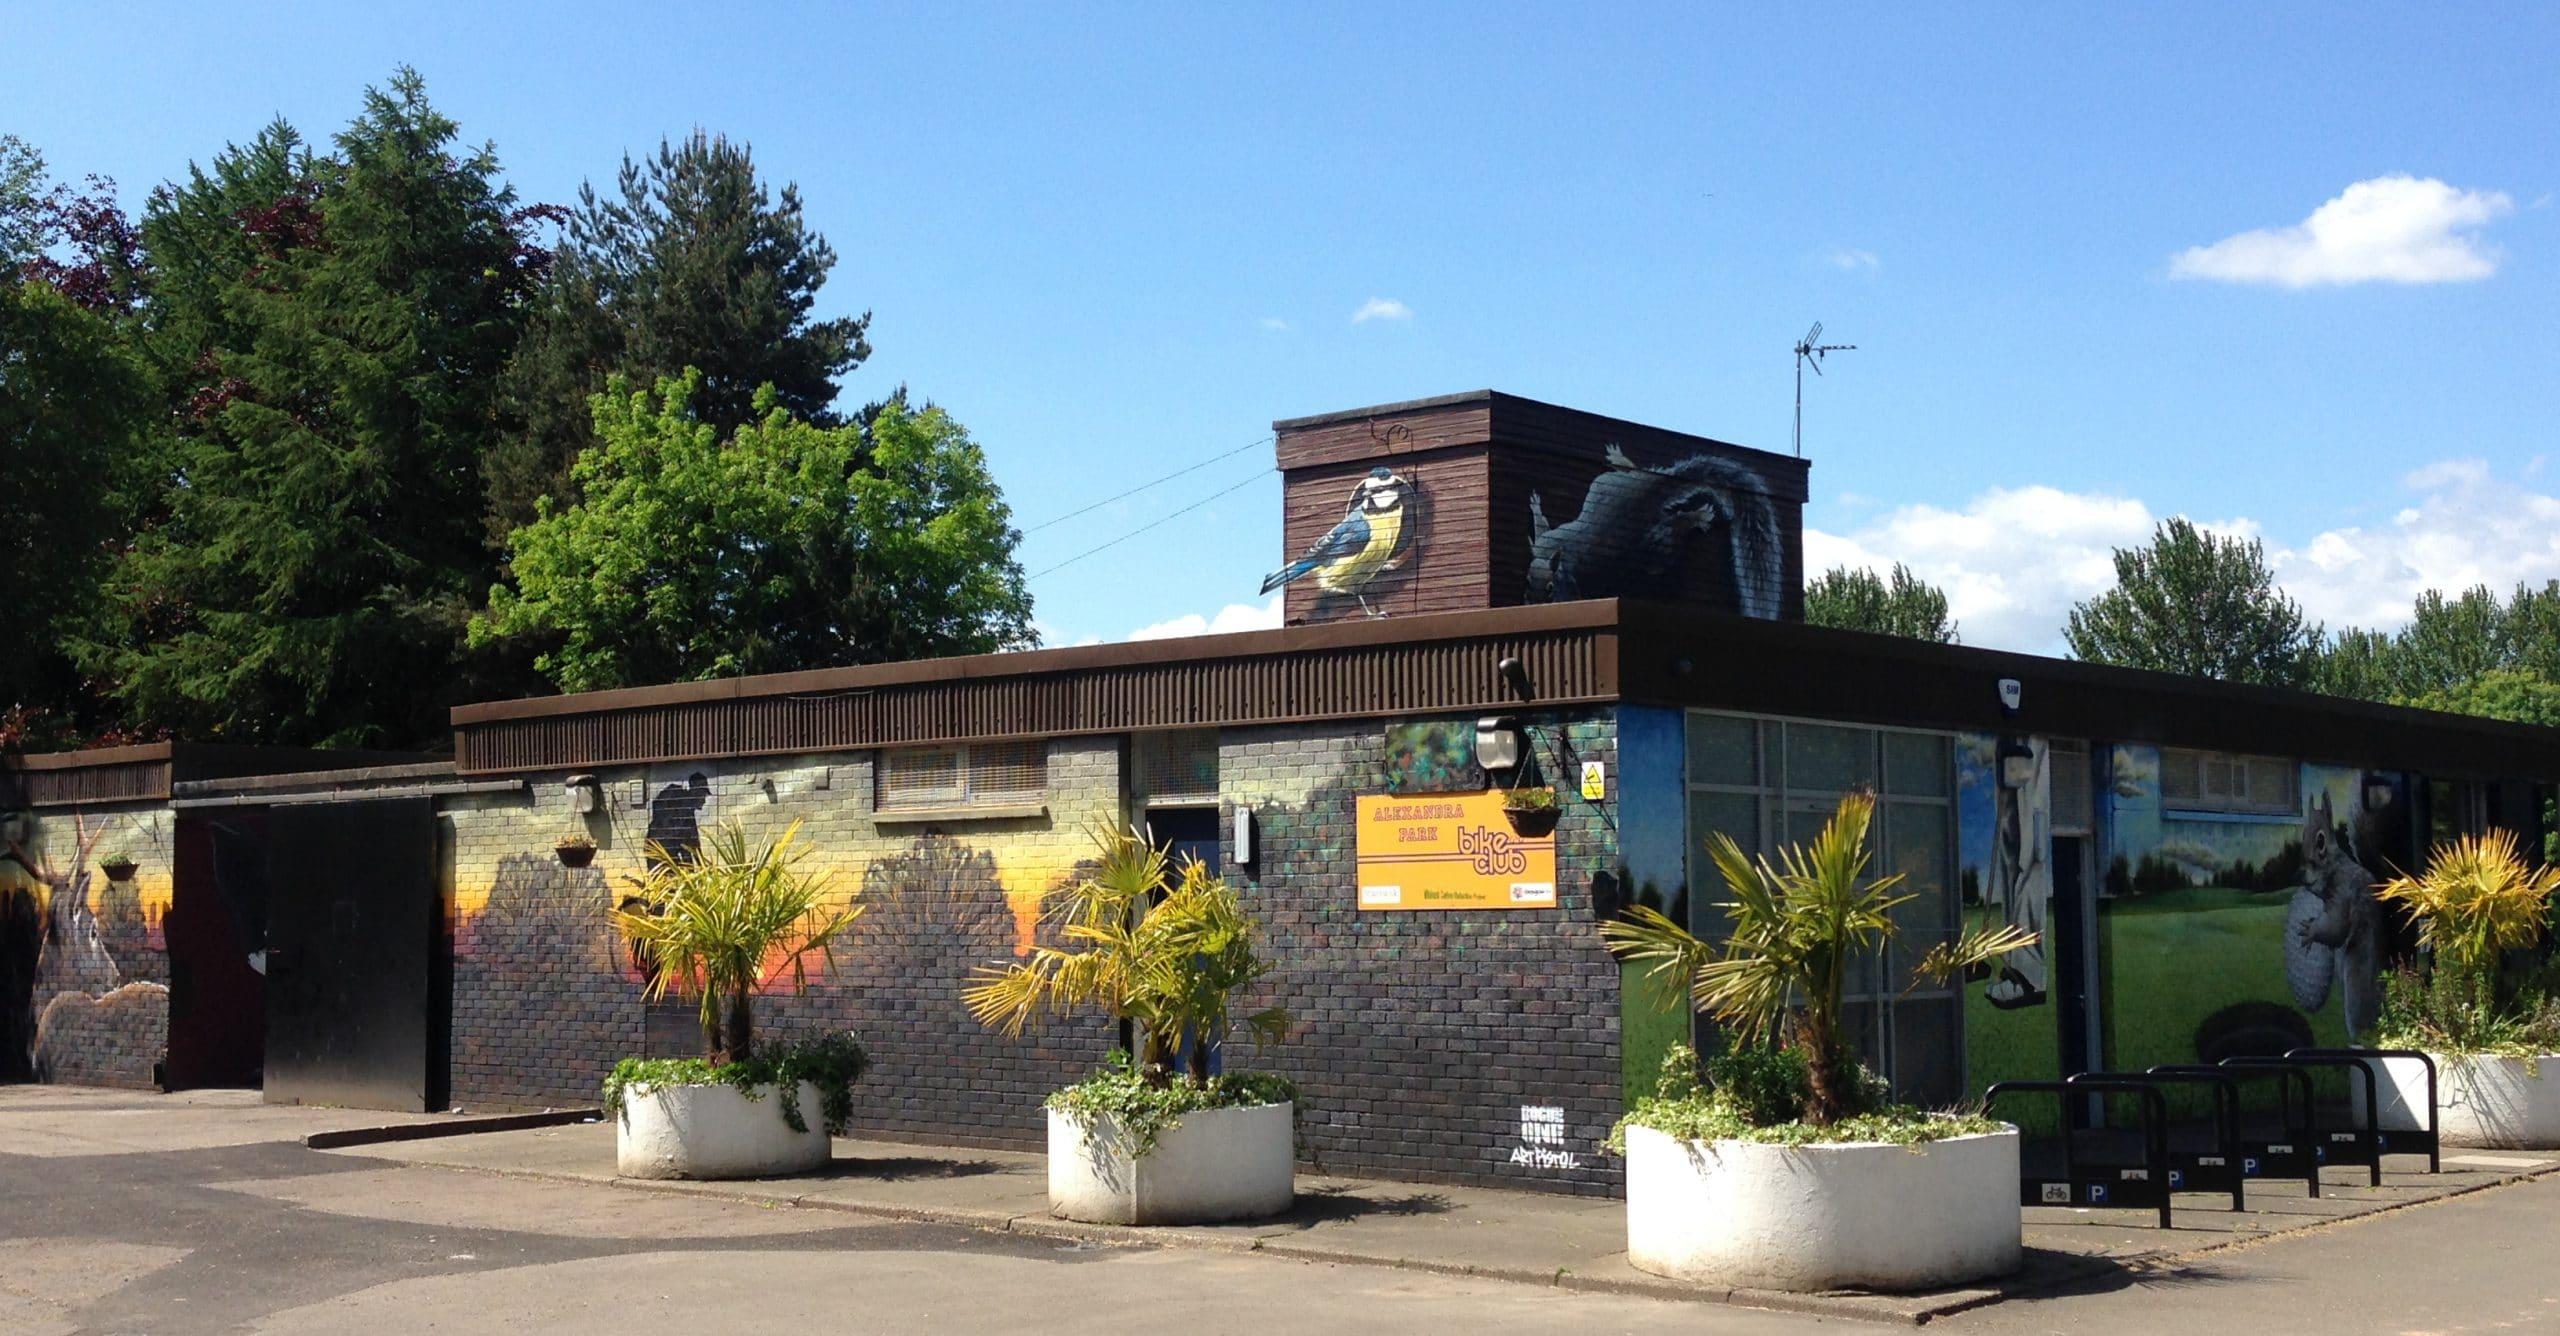 Community centre mural Scotland